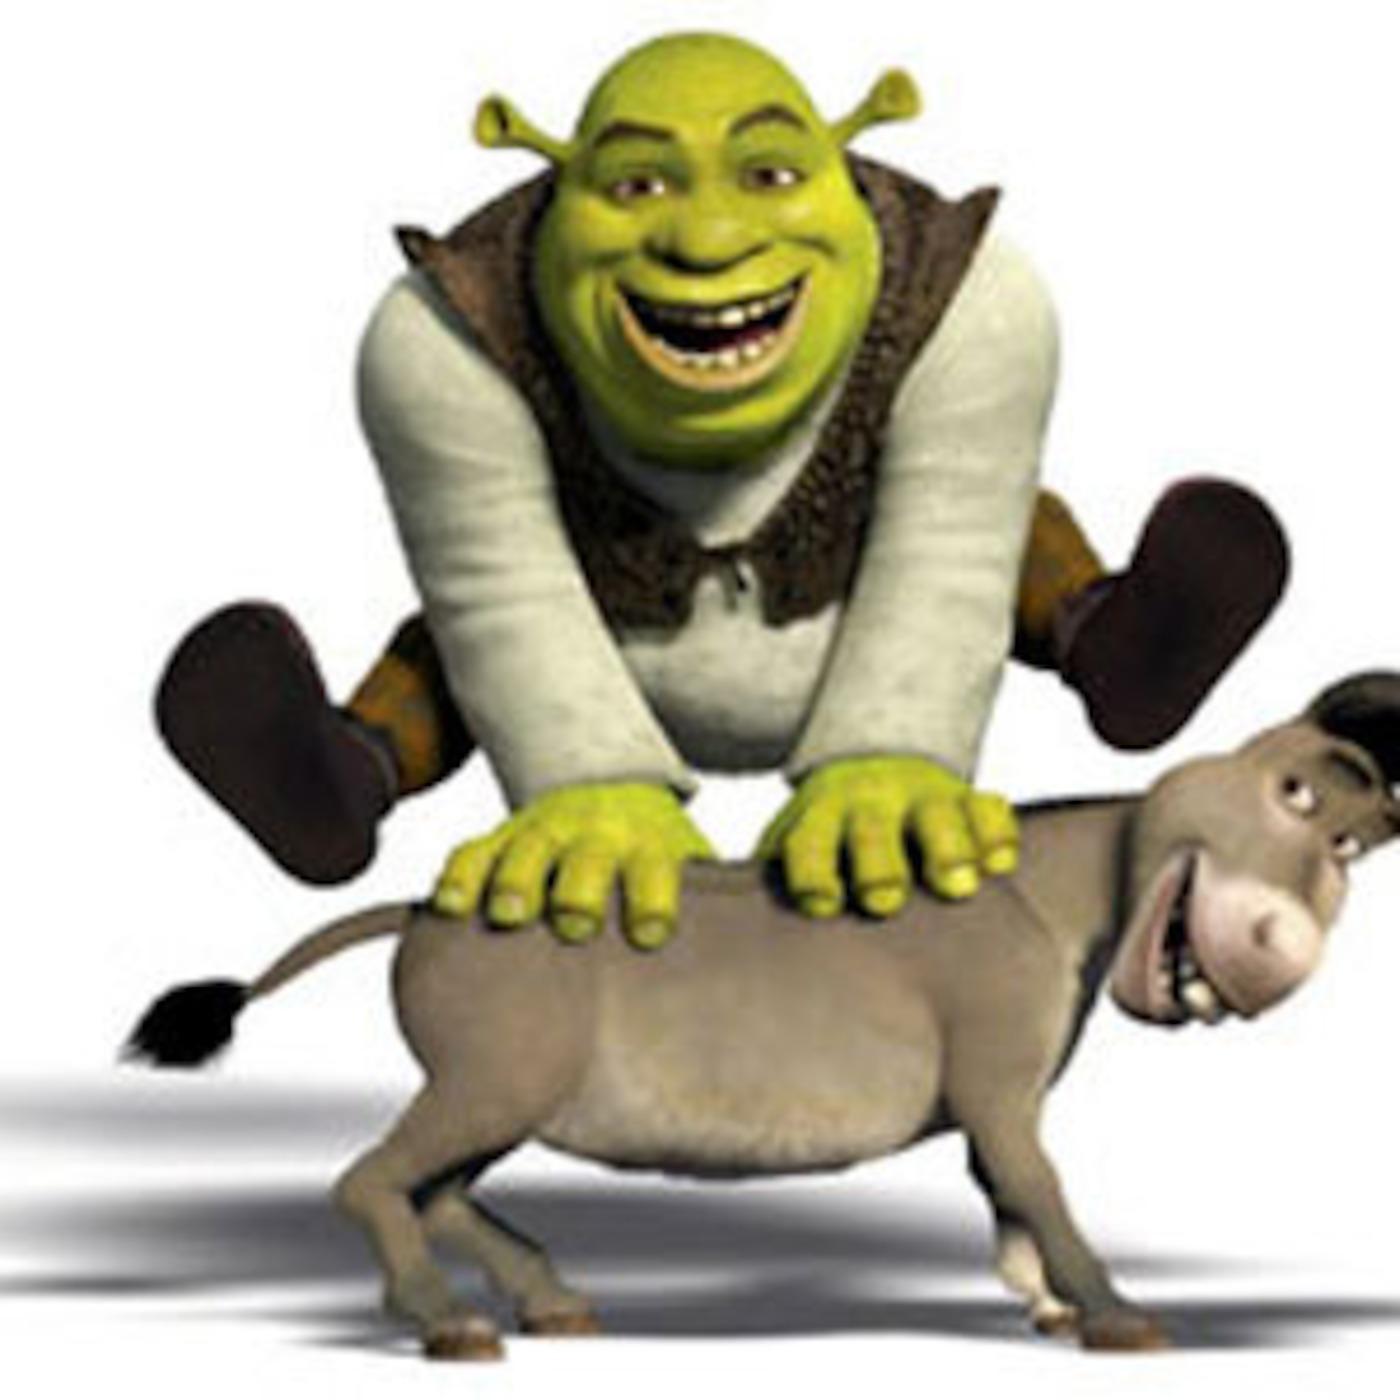 Shrek & fiona carton caertaure nsfw gallery